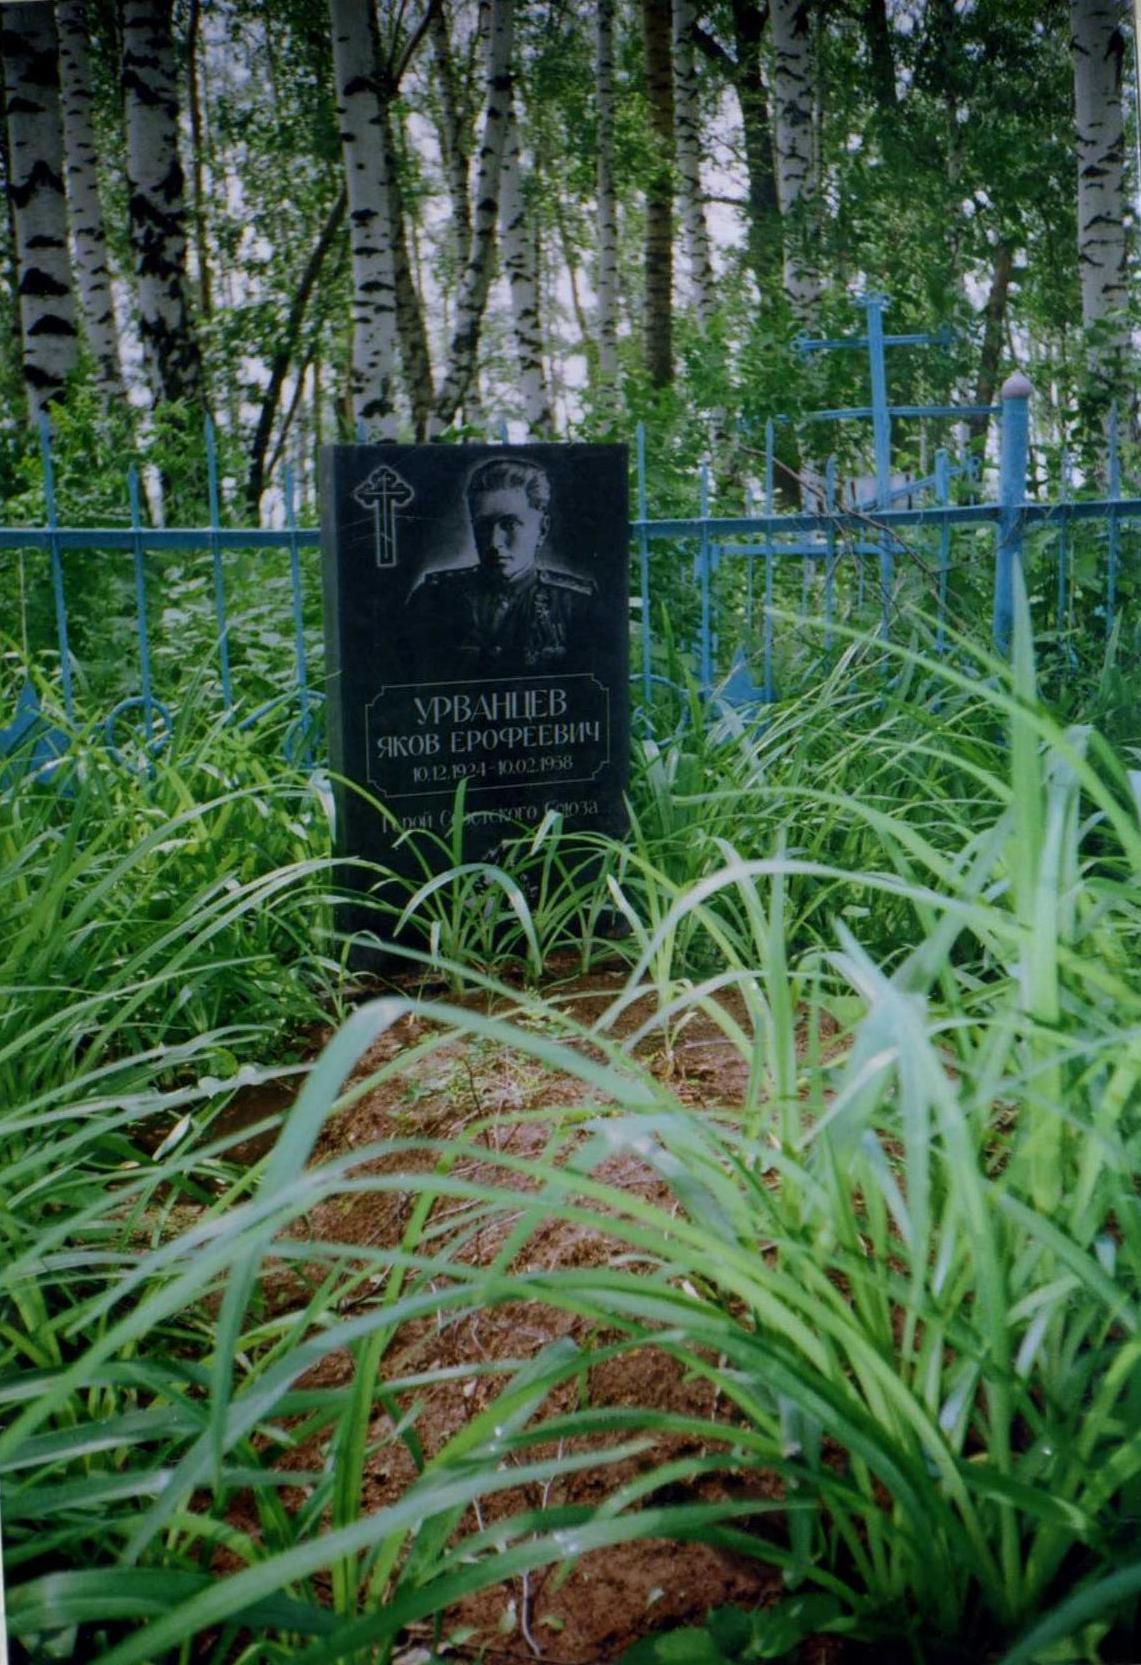 Гранитный памятник на могиле Я. Е. Урванцева.